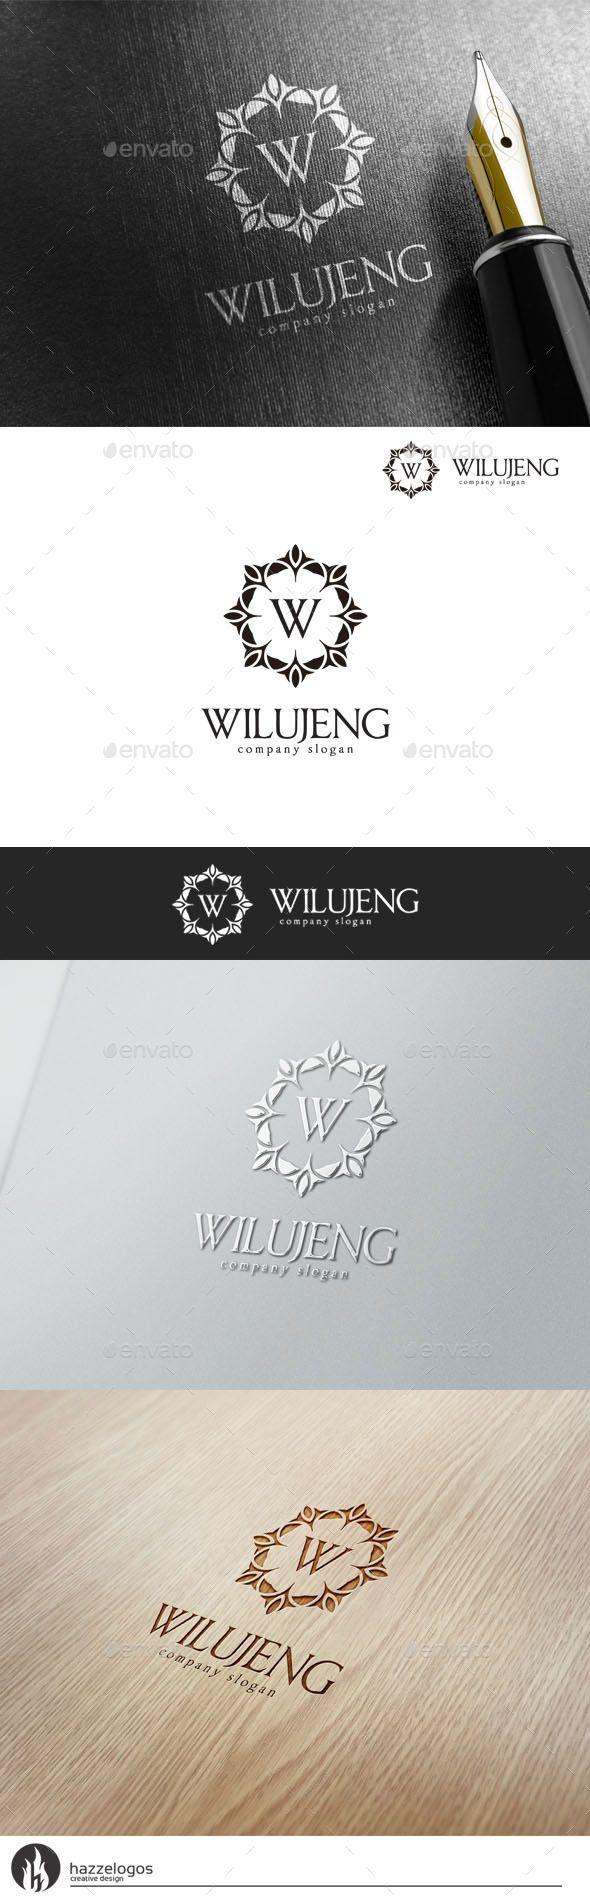 Wilujeng Logo (AI Illustrator, Resizable, CS, apparel, boutique, brand, branding, business, classic, classy, company, corporation, crest, crown, decorative, elegant, emblem, fashion, furniture, hotel, imperium, jewelry, luxurious, luxury, ornament, real estate, resort, restaurant, royal, vector, victorian, vintage, winery)